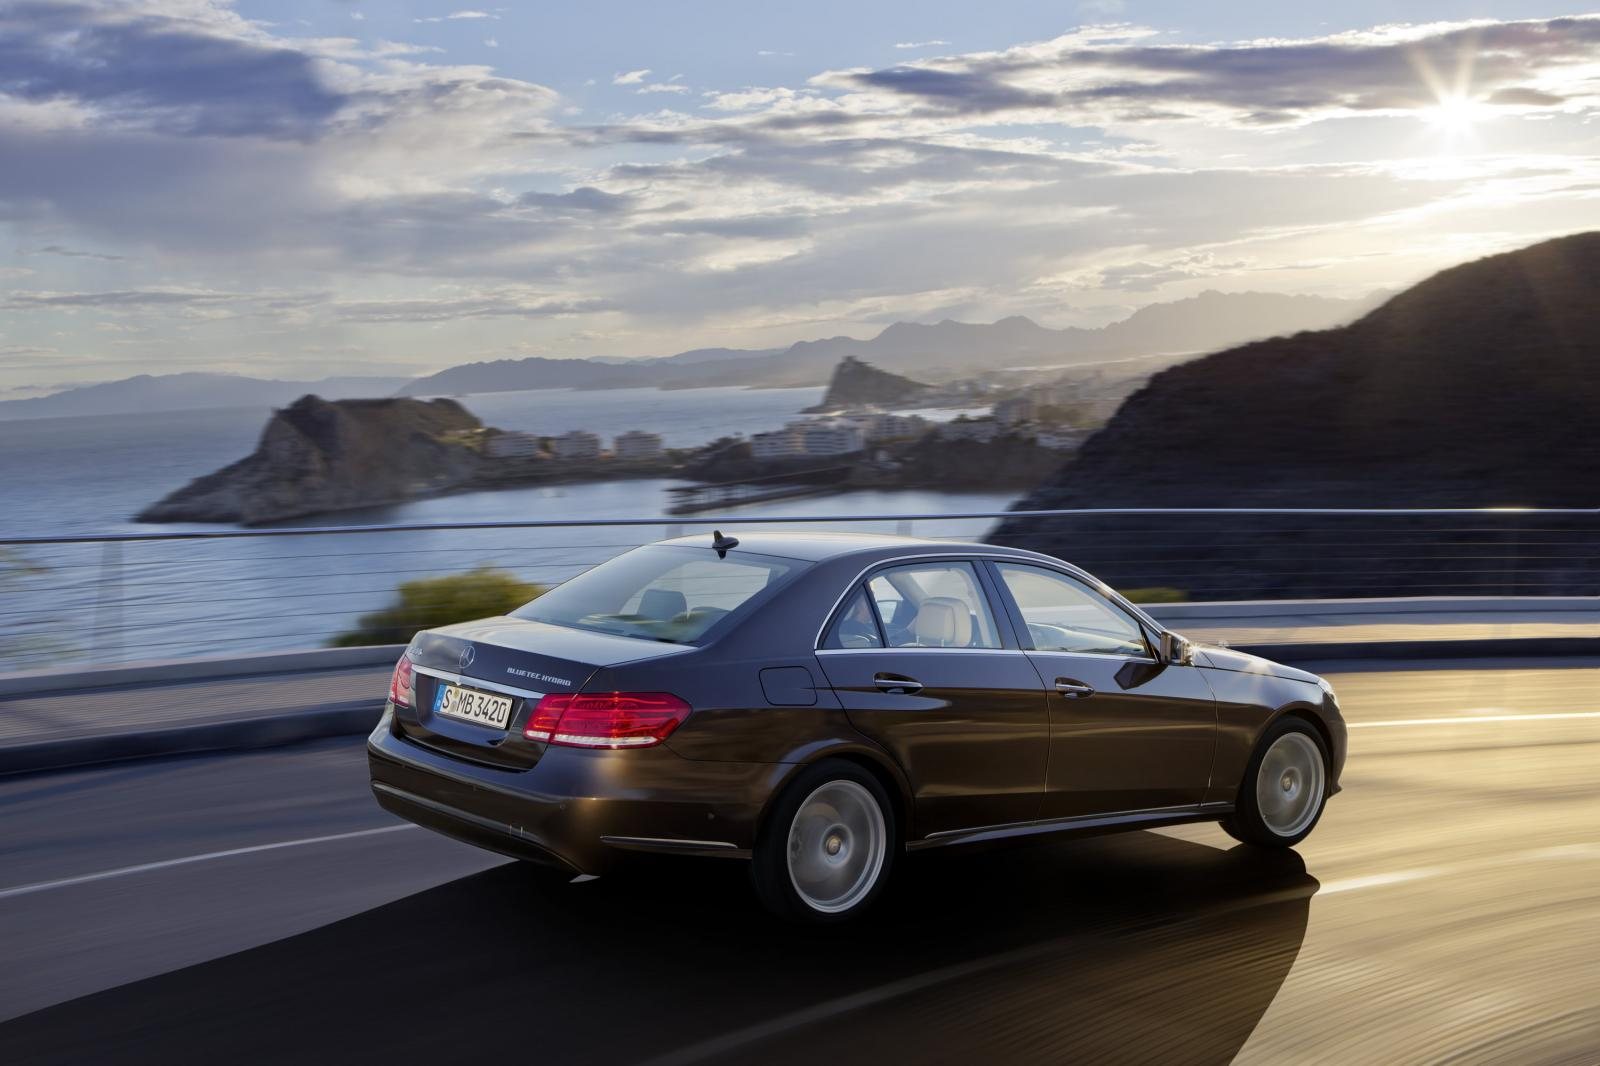 mersedes+arabalar+HEDZA+%252815%2529 Mercedes Modelleri